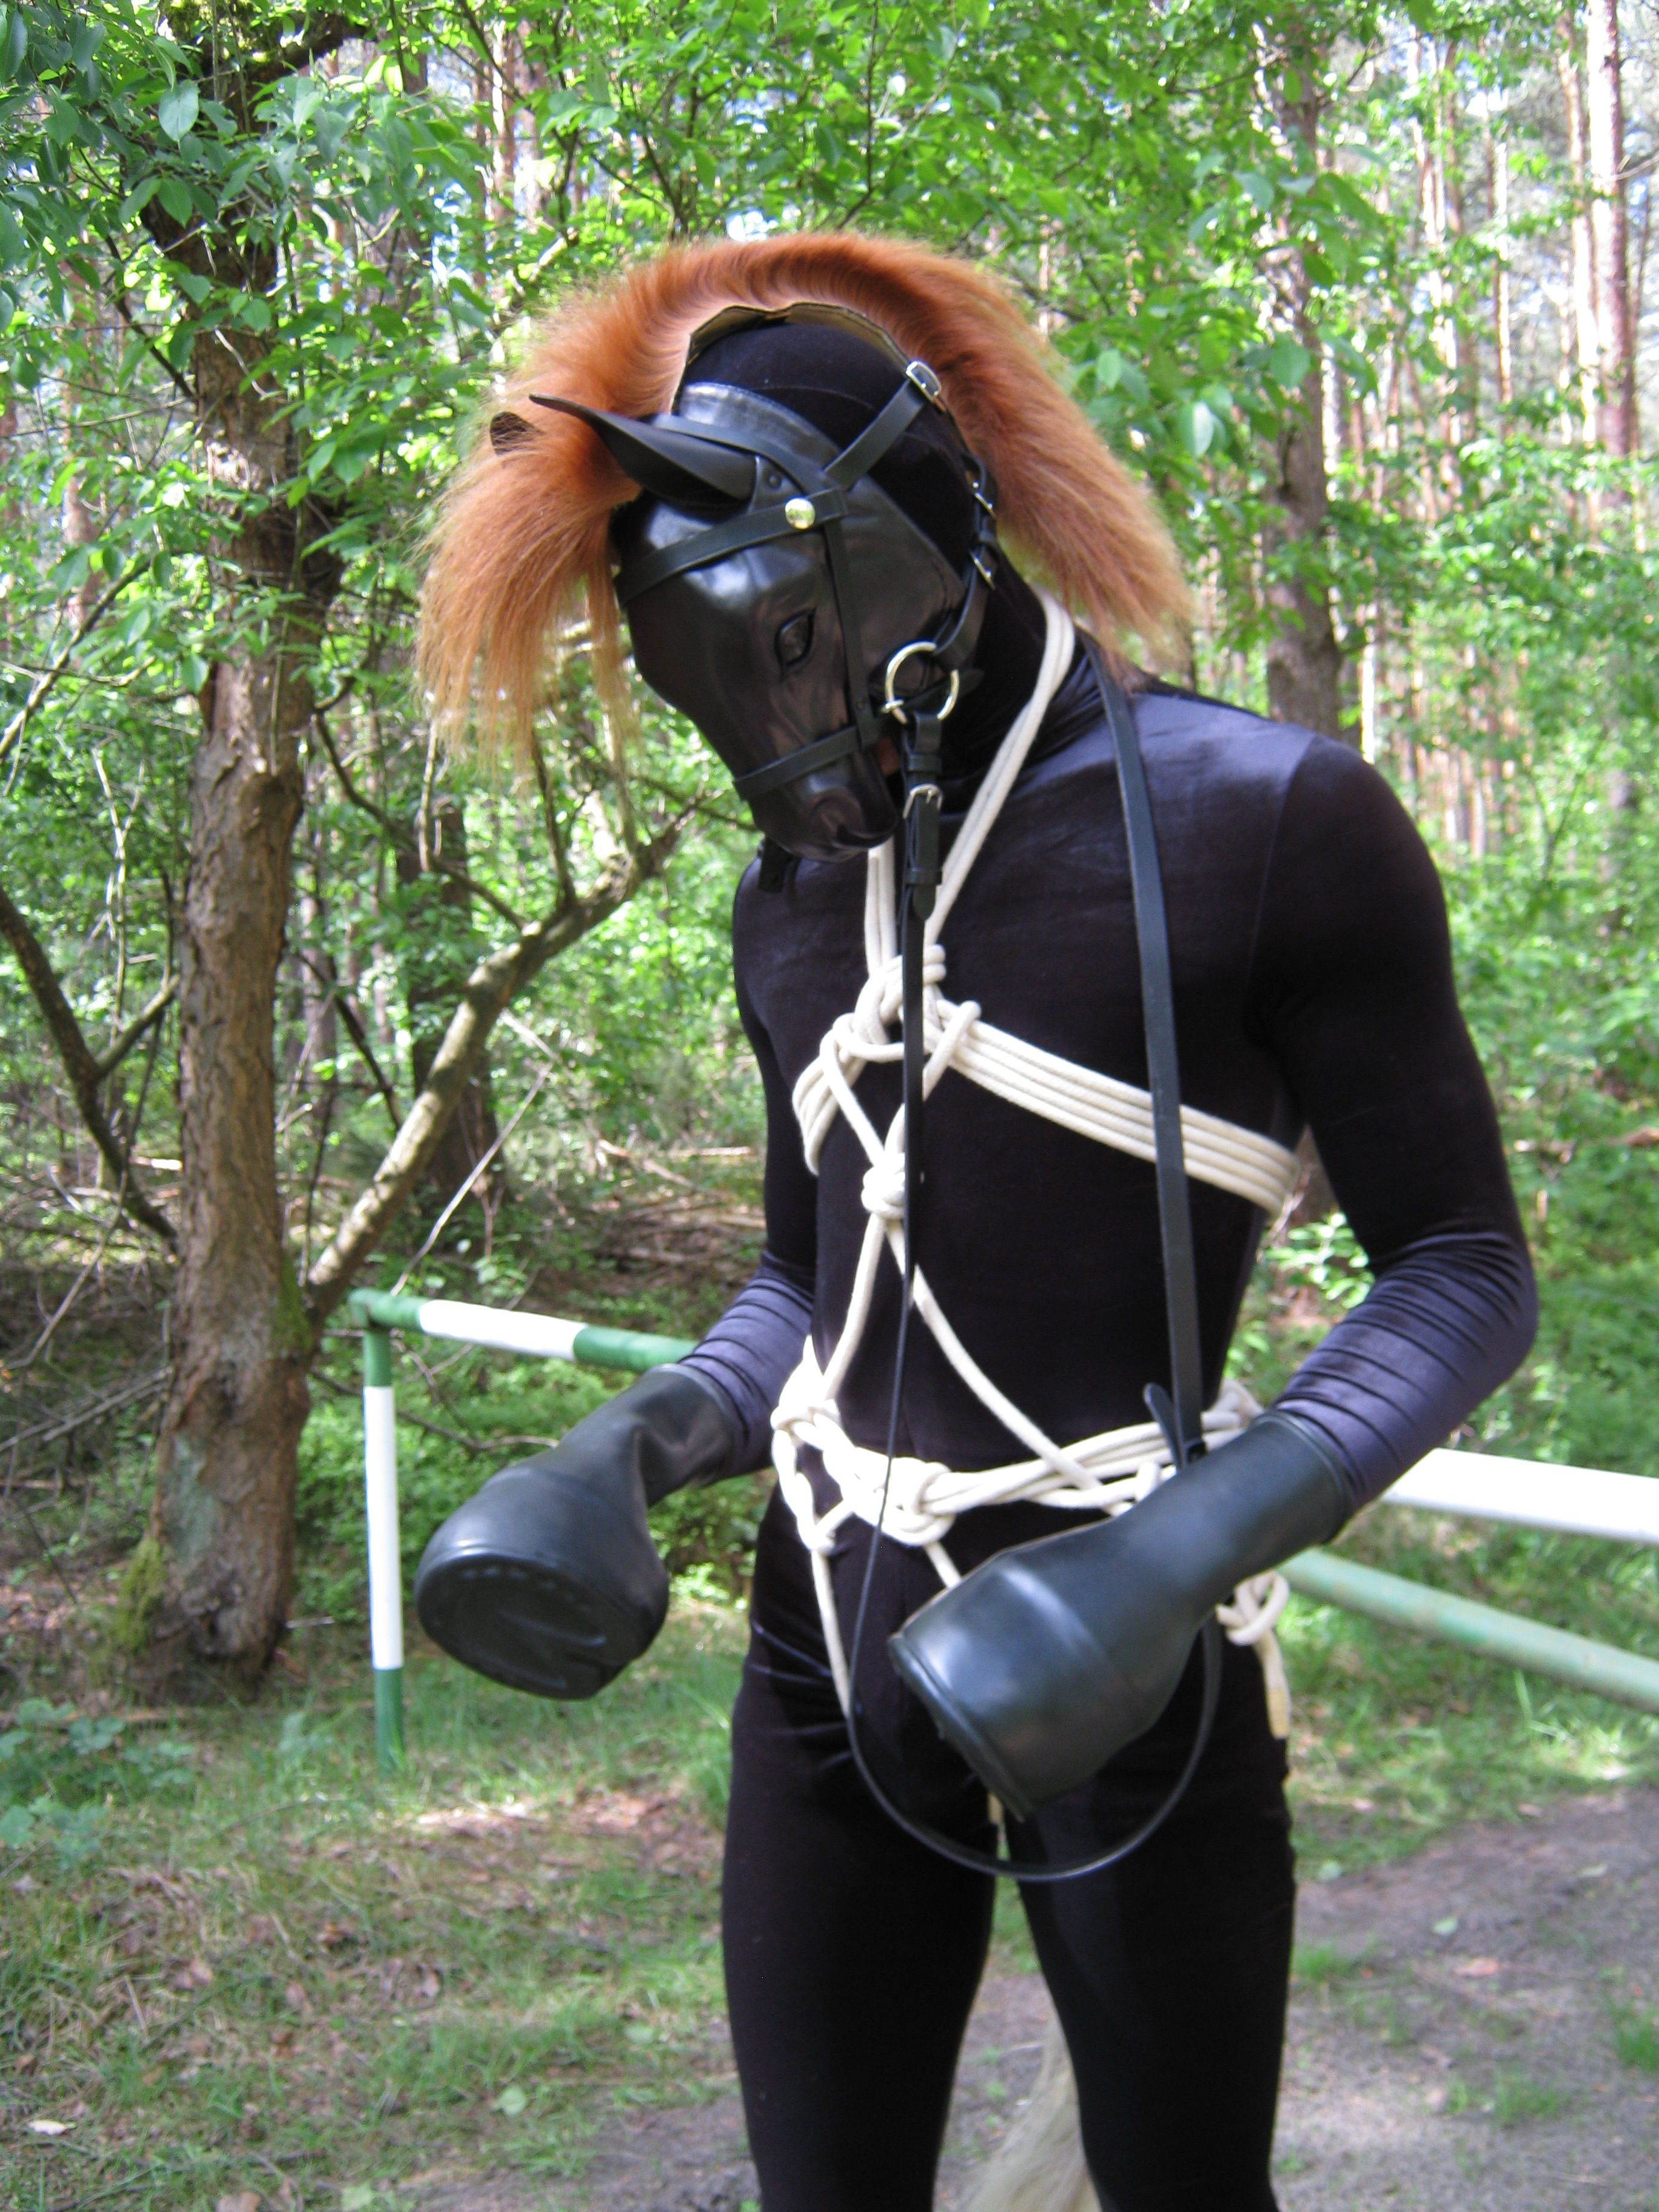 Human Ponyplay Hidden Deep Riding Helmets Horse